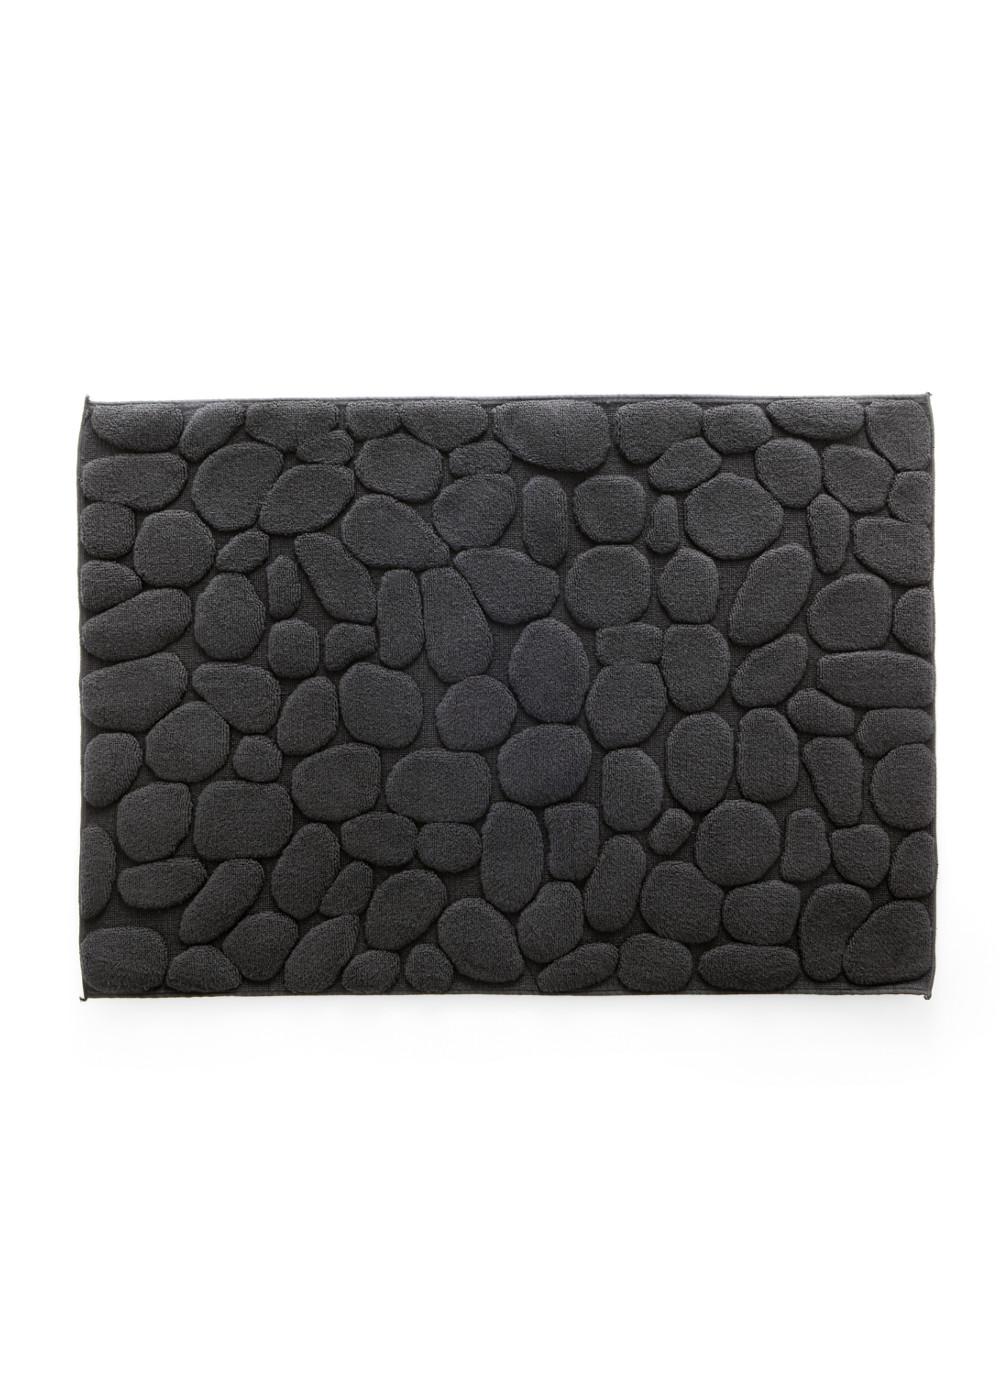 Ottaipnu-IshikoroBathMat-Dark-gray1